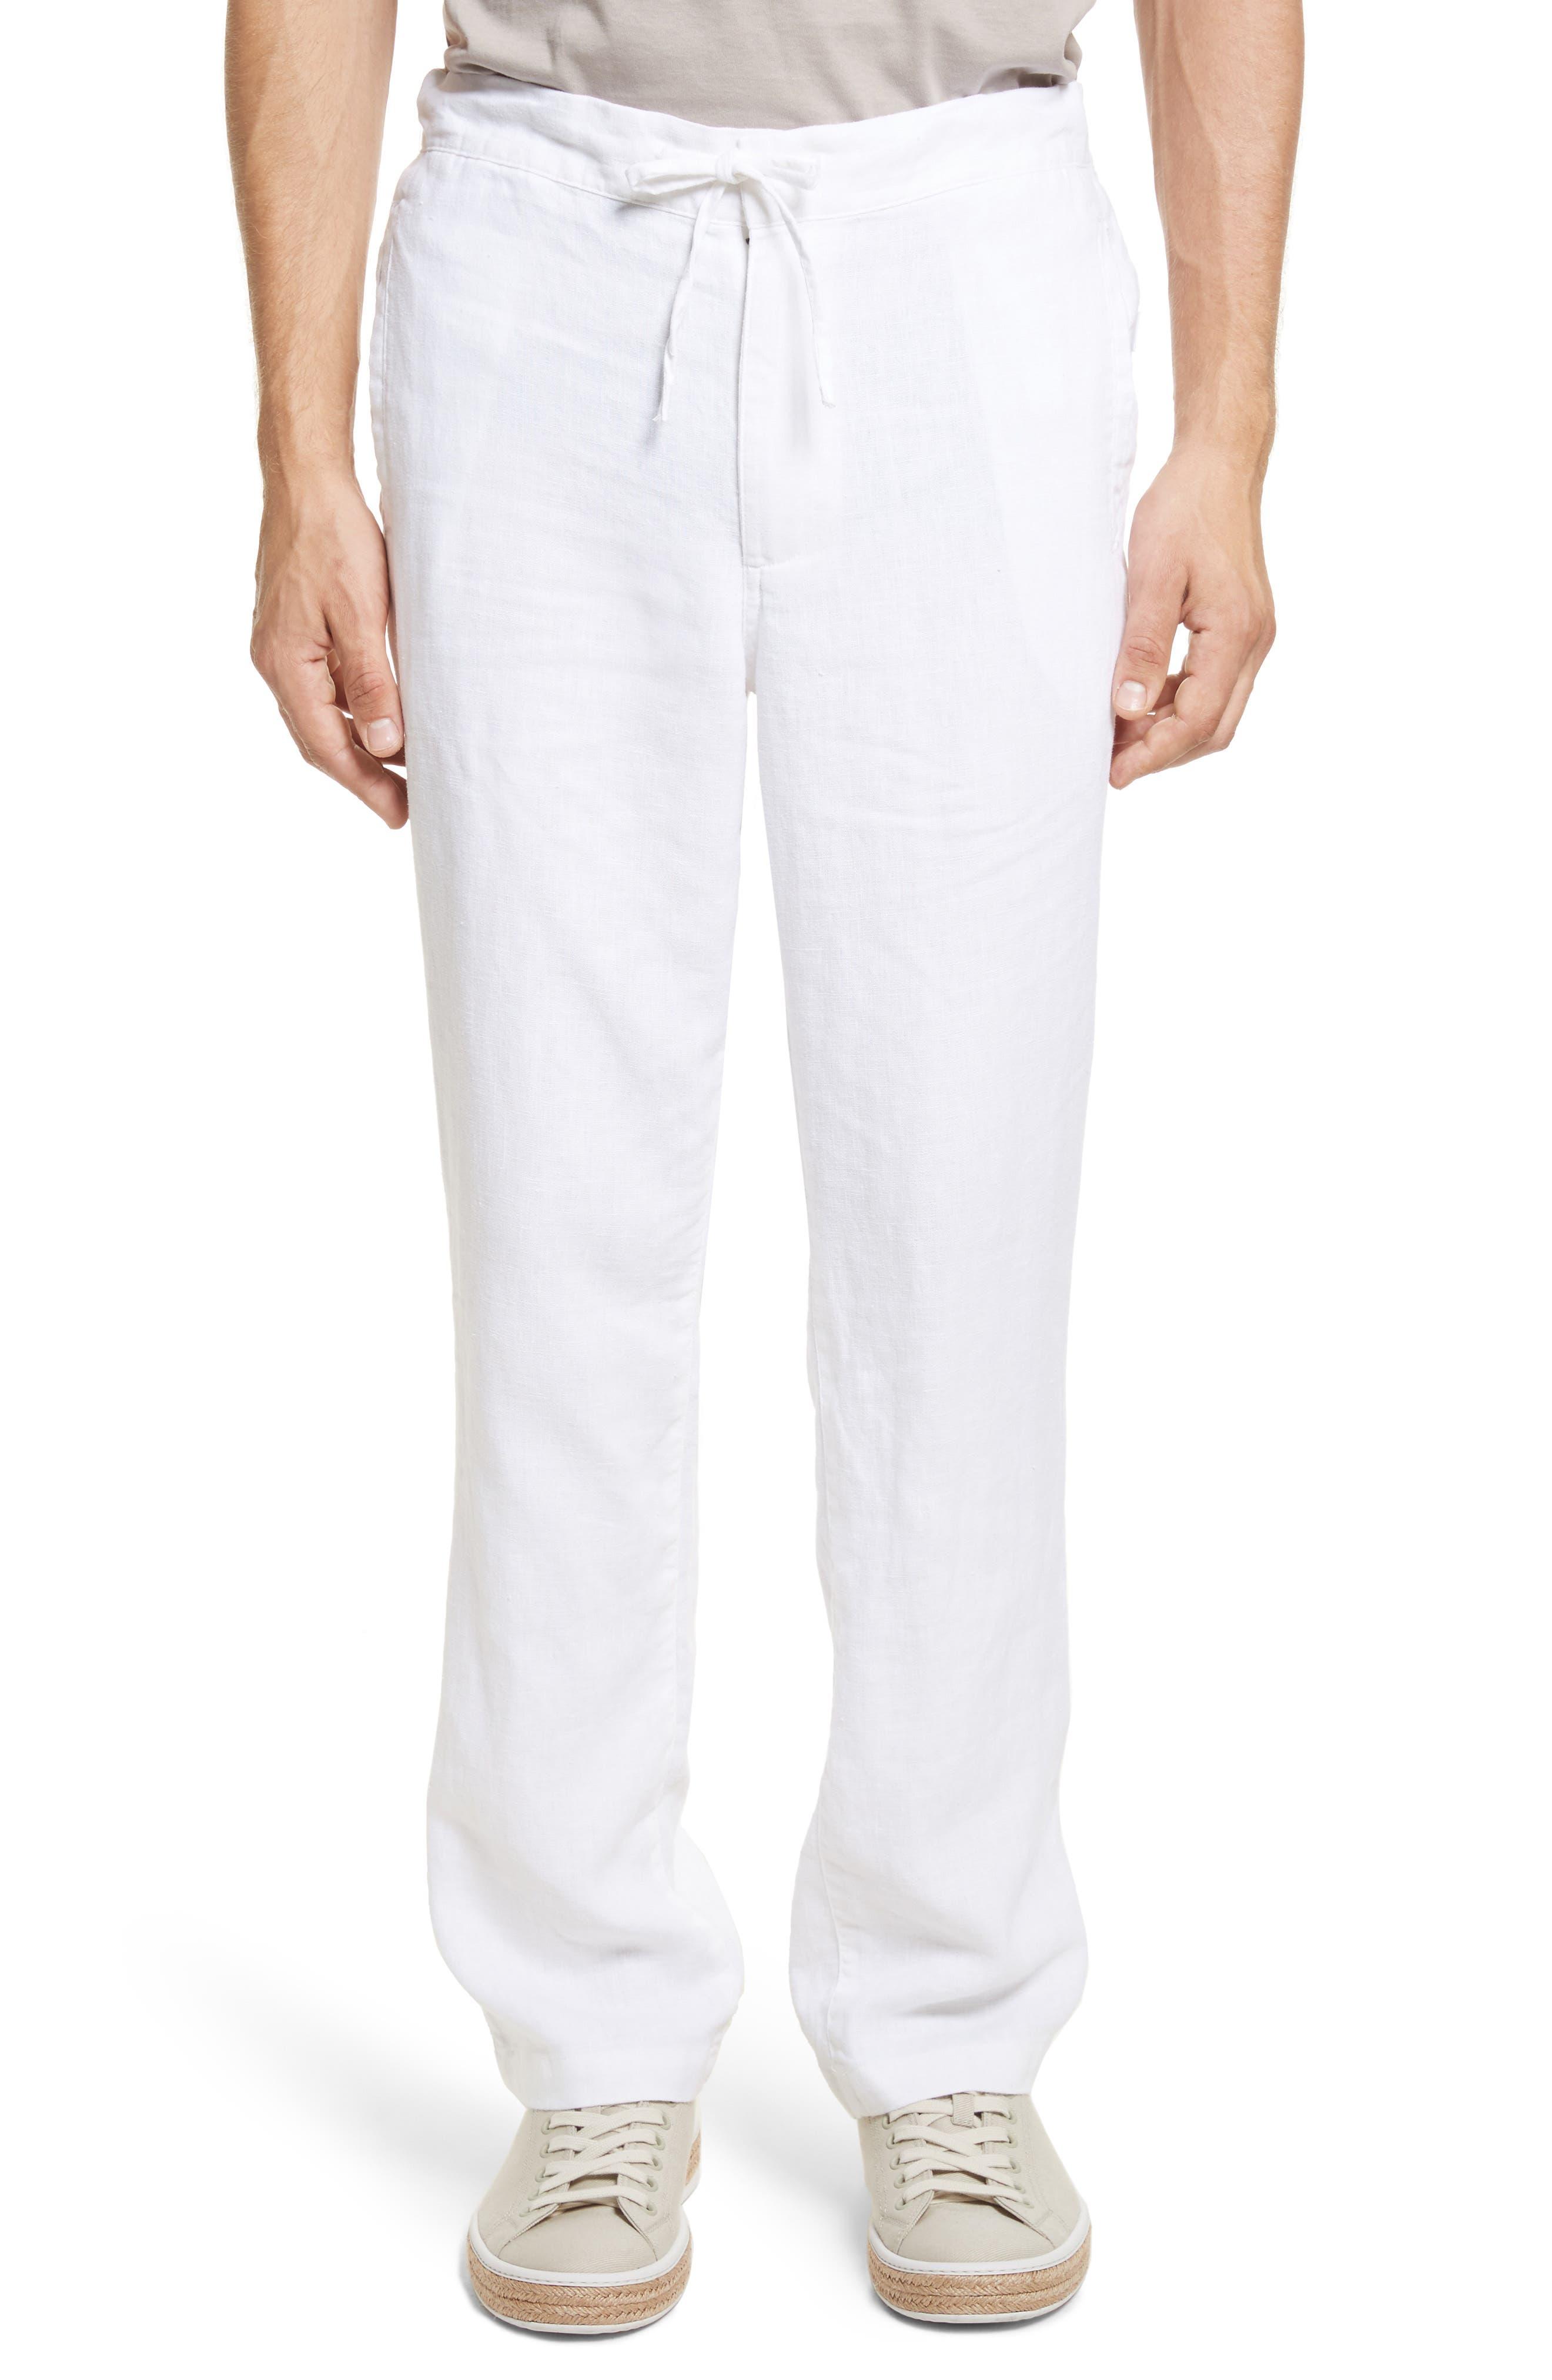 Collin Linen Pants,                             Main thumbnail 1, color,                             100